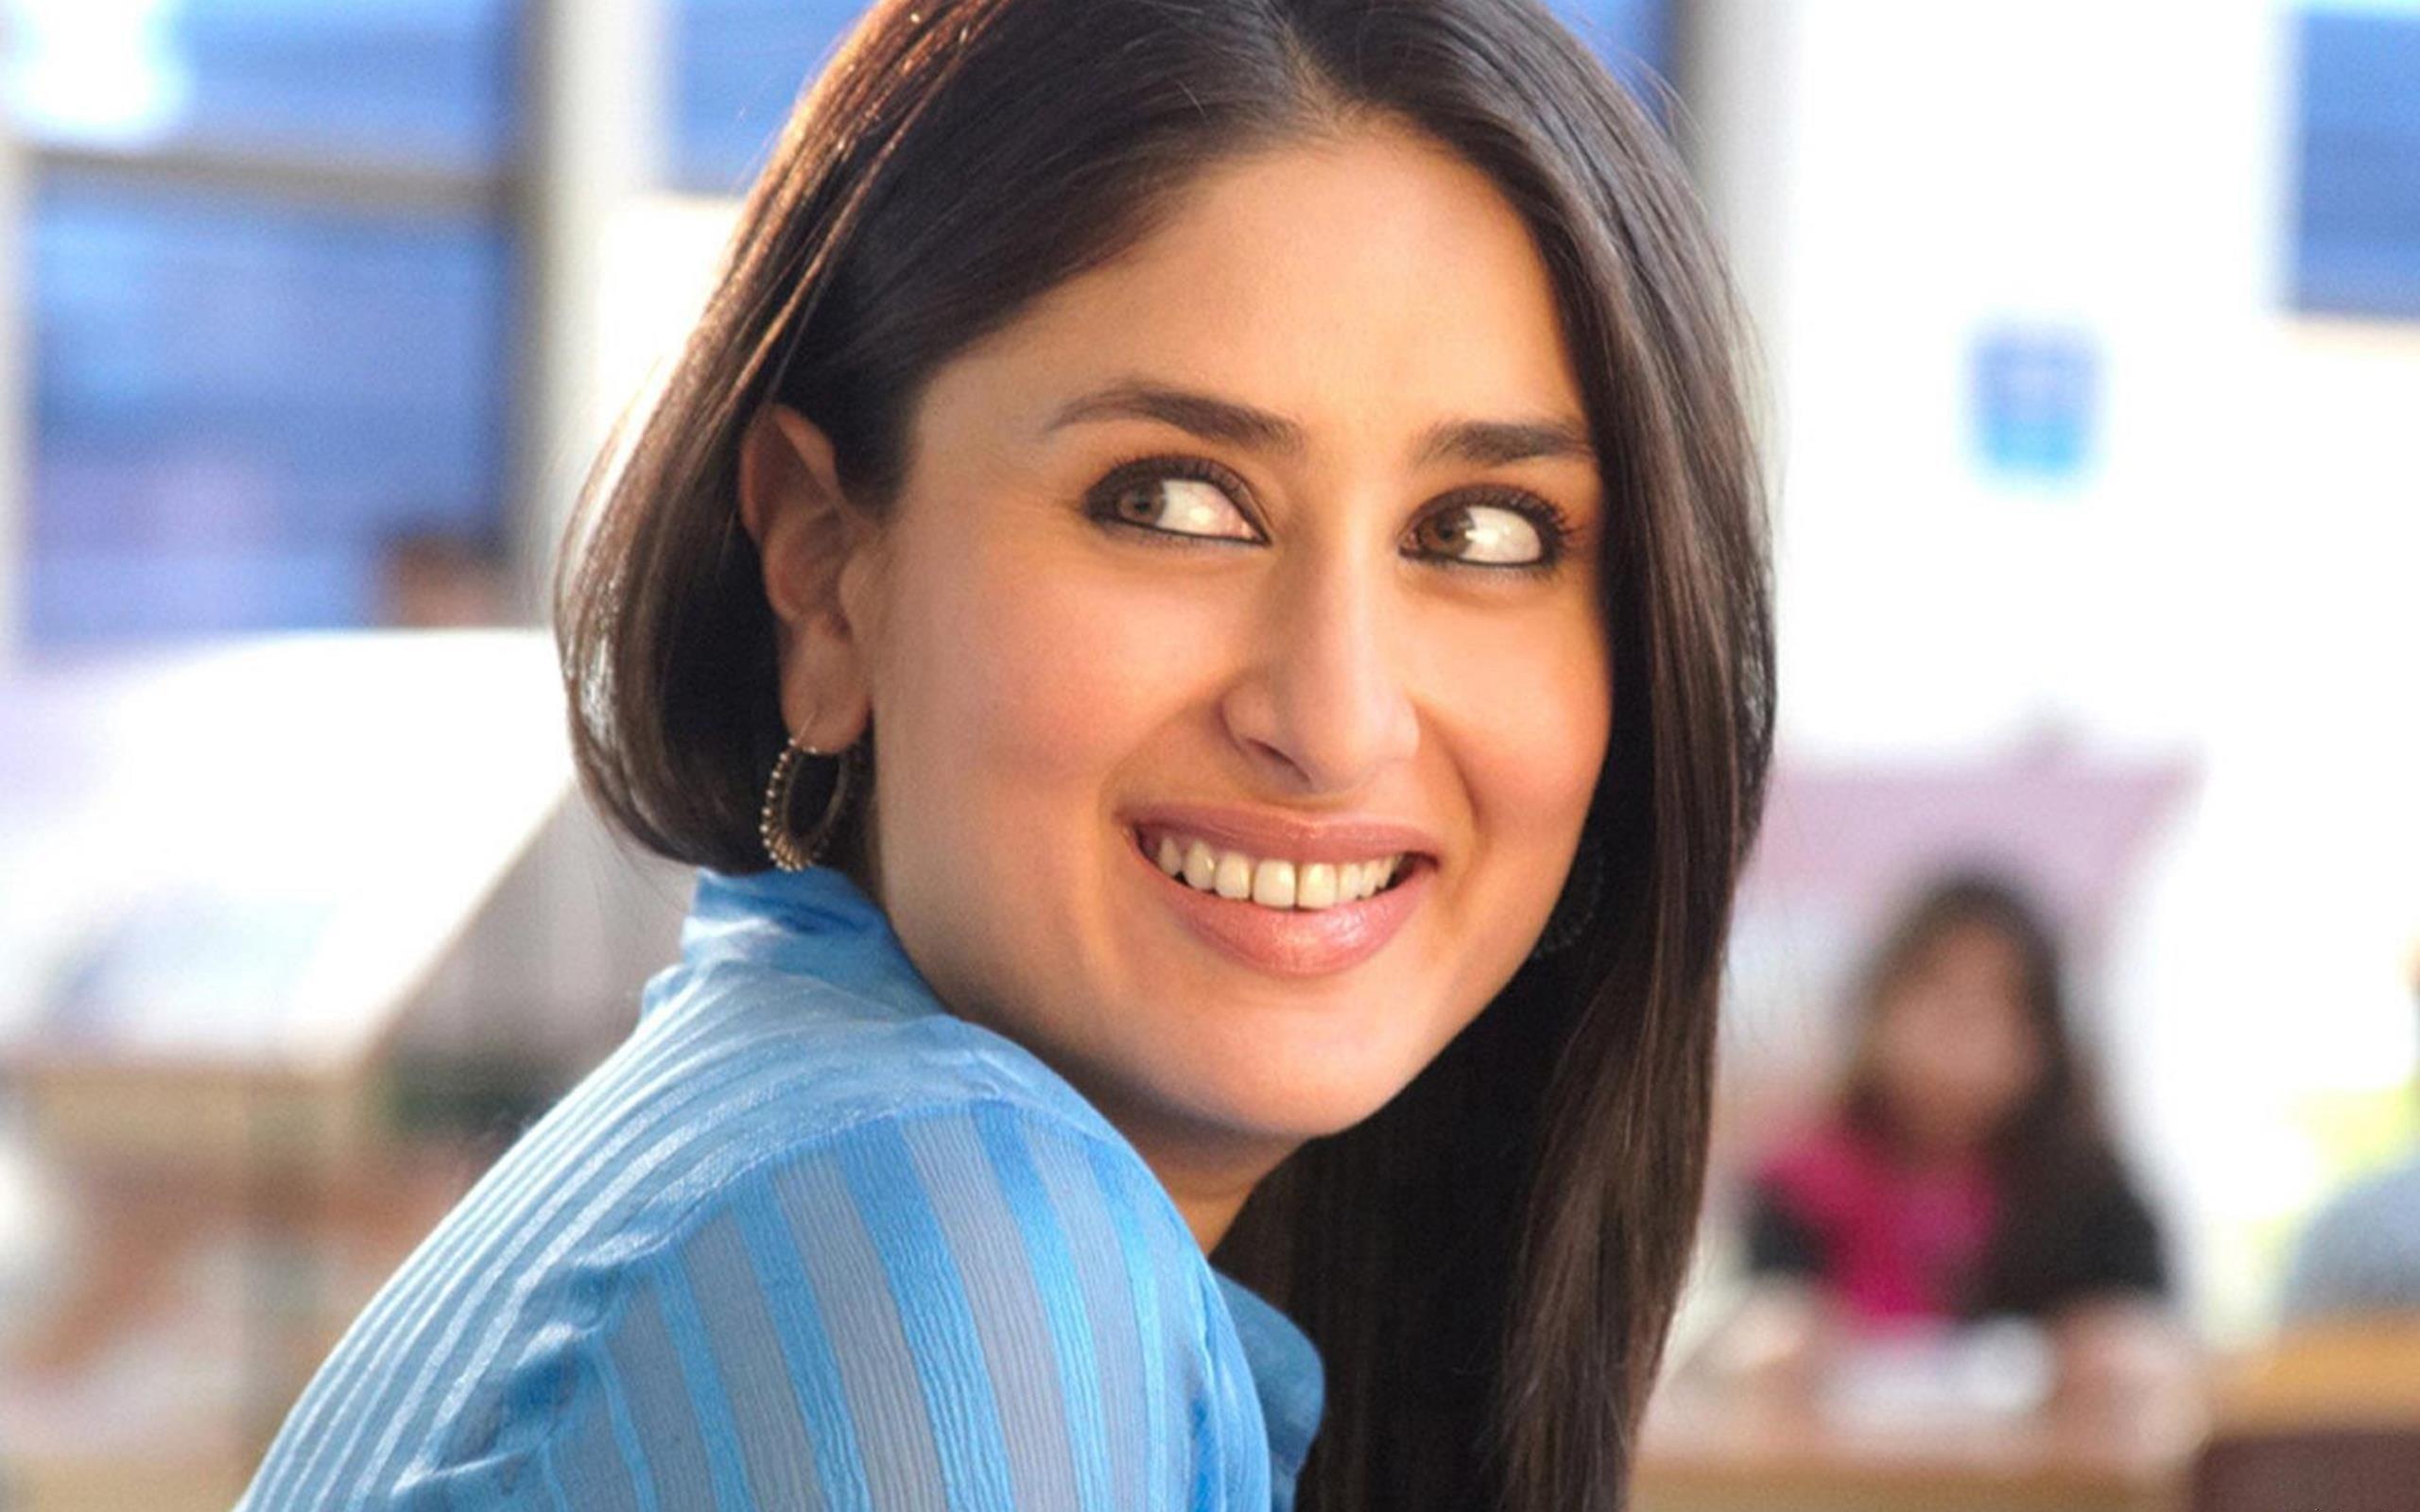 Kareena Kapoor Wallpapers, Pictures, Images